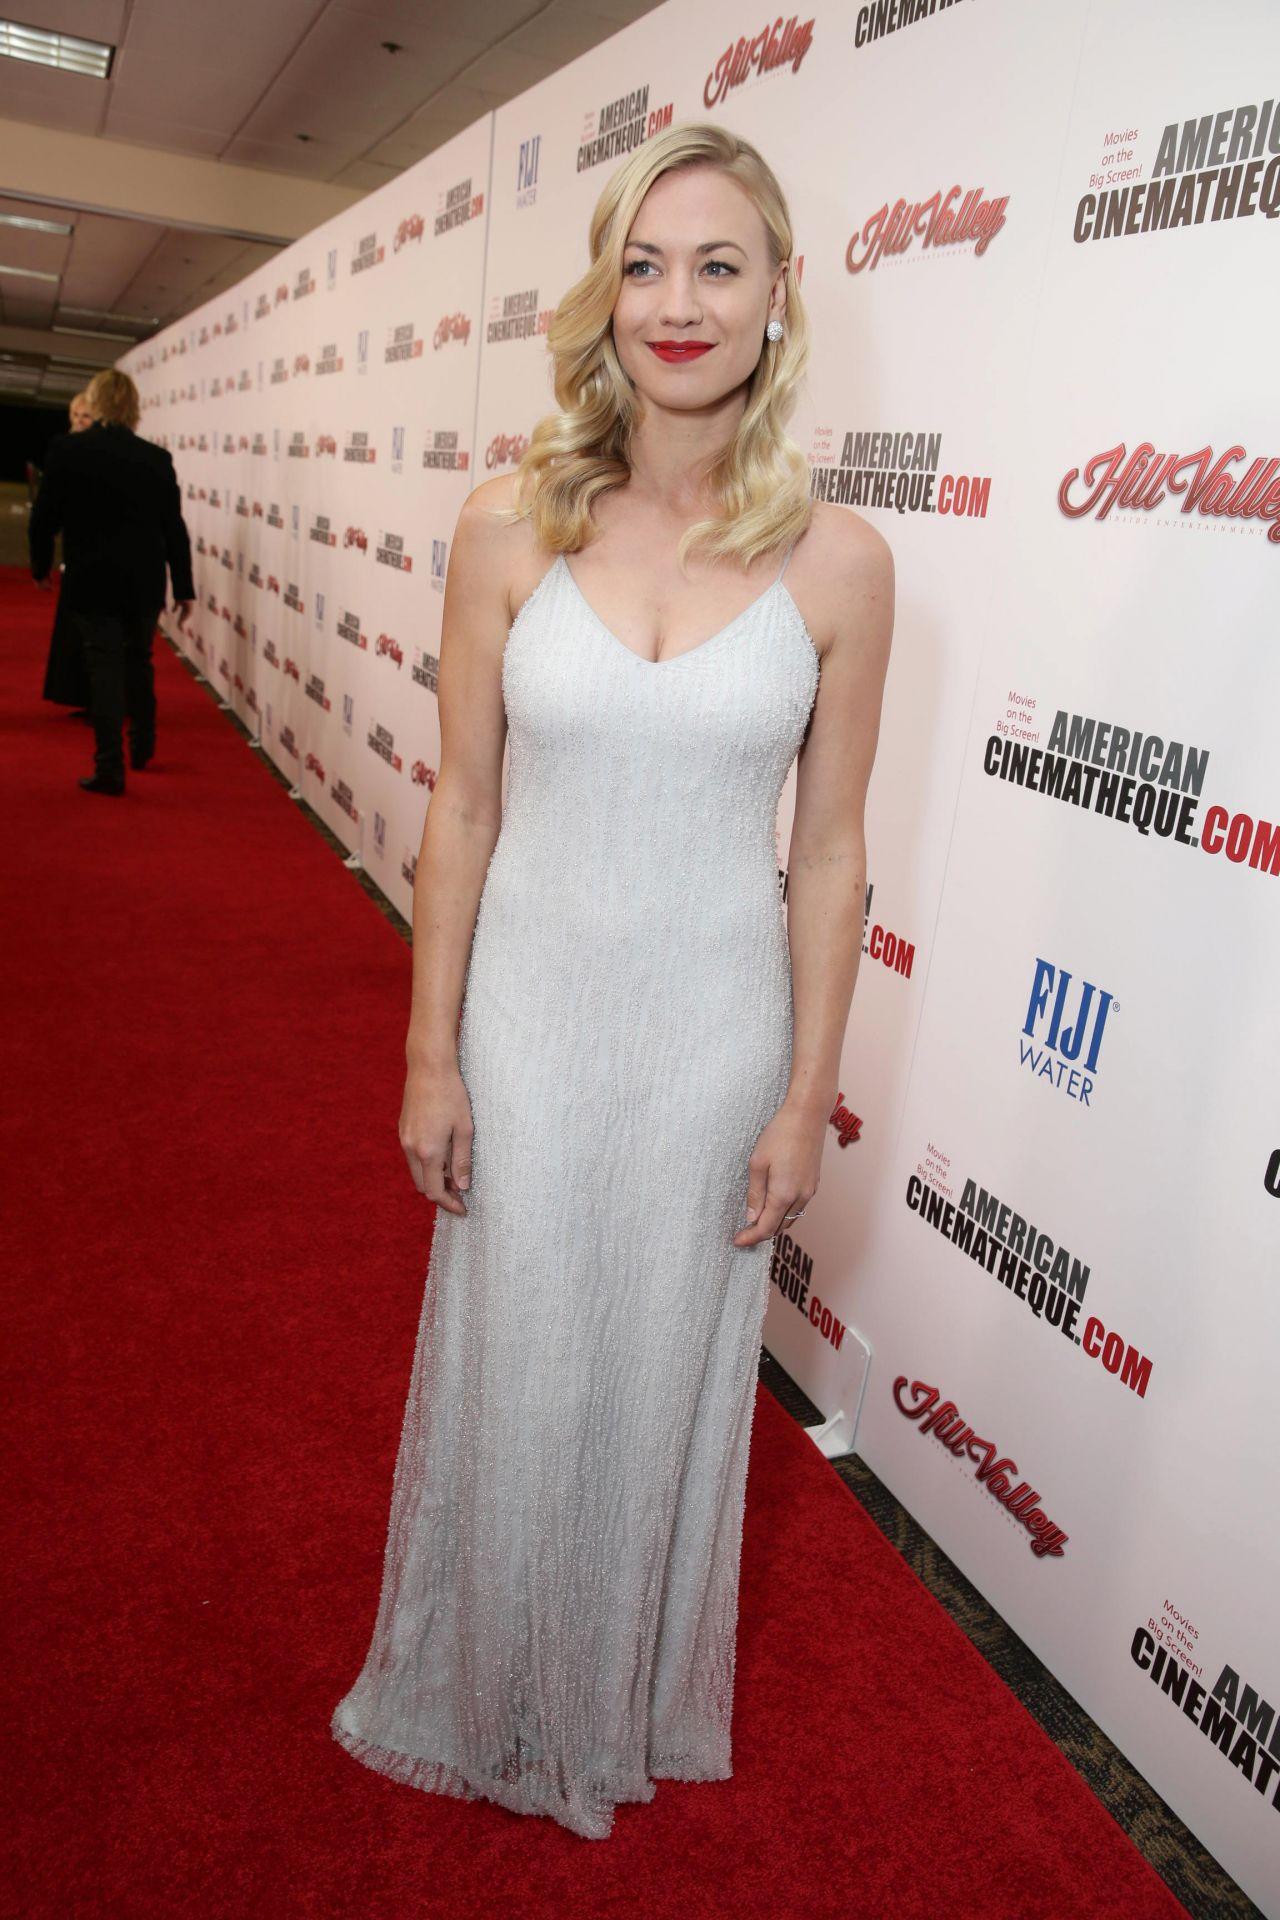 Yvonne Strahovski 2015 American Cinematheque Award